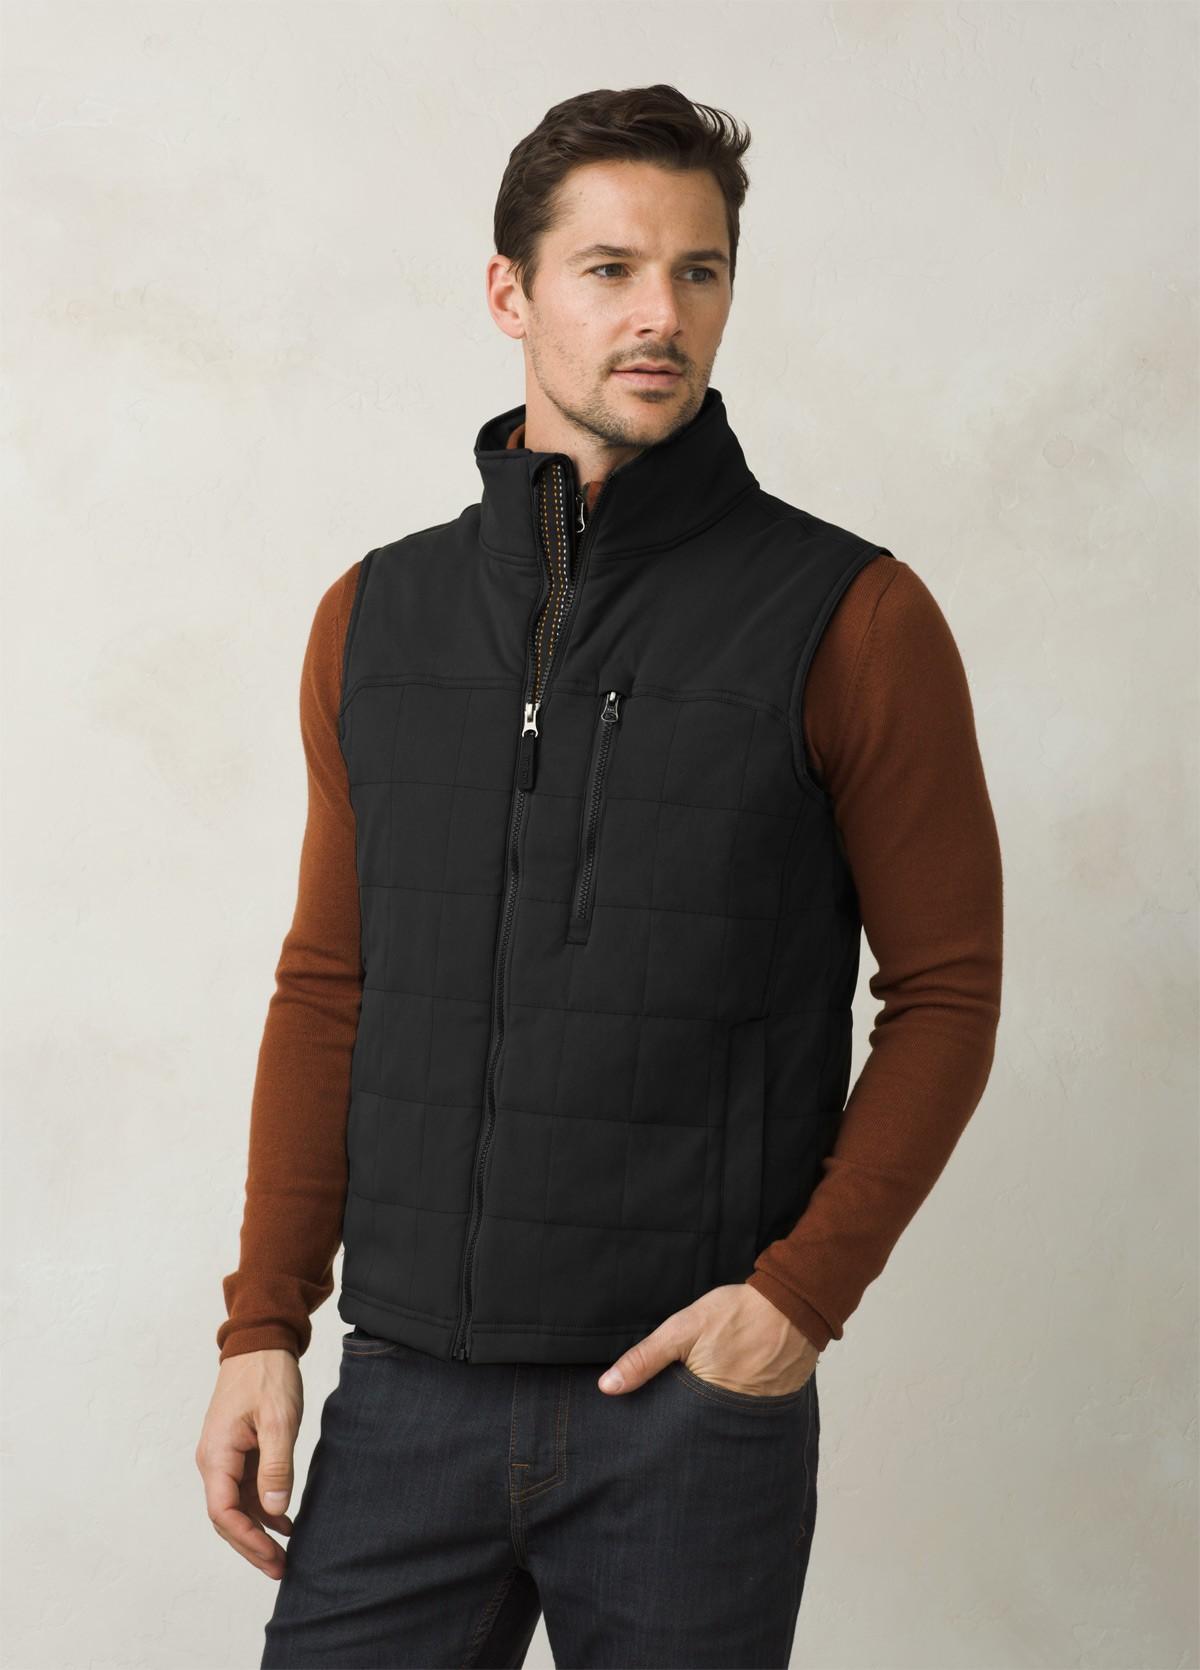 vest for men view larger image xgyvwtc